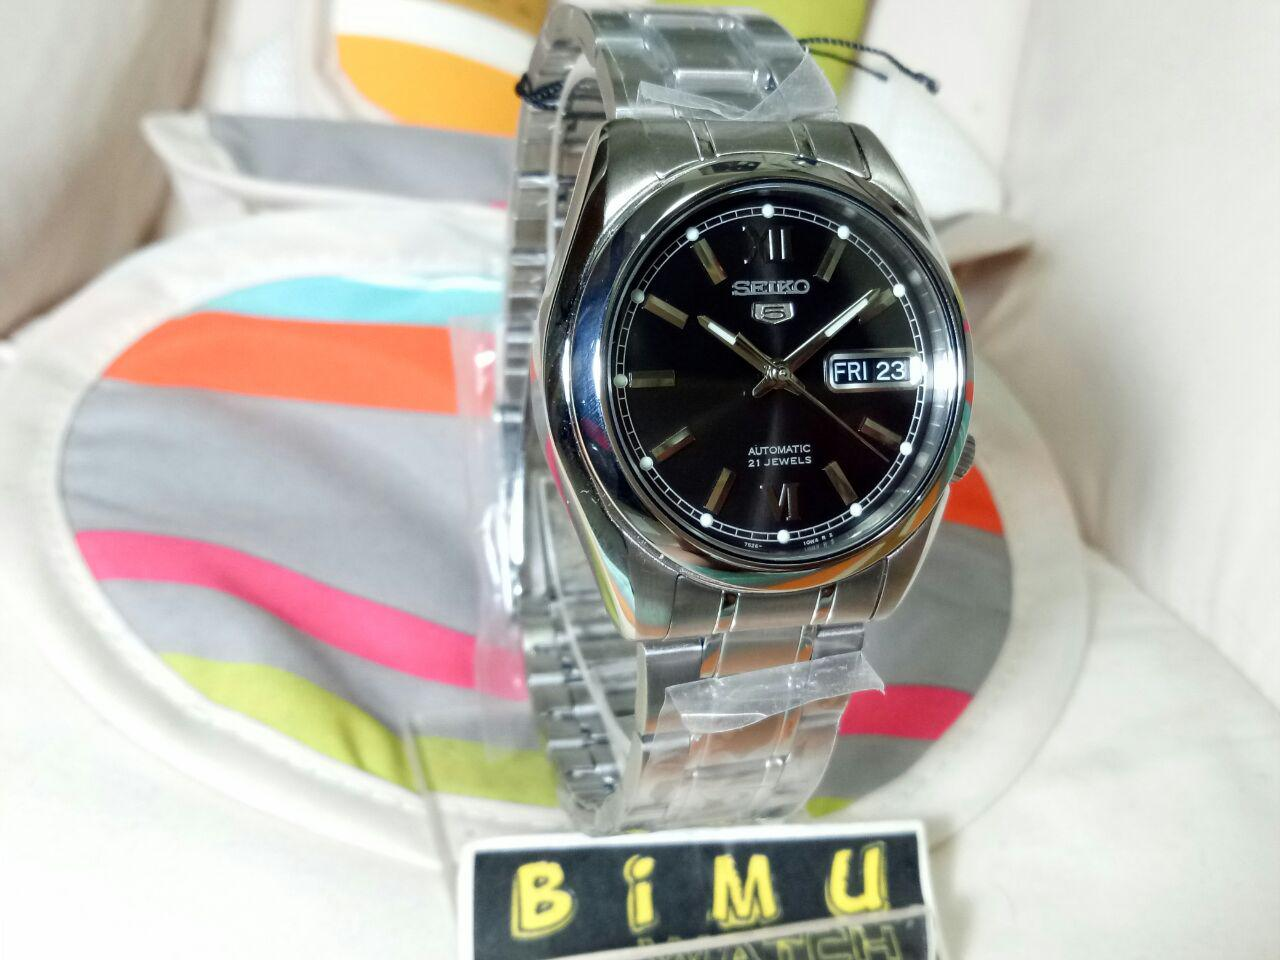 Nam Watch Mahameru Automatic Mh003 Black Stainless Steel Seiko Srpa16j1 Original Jam Tangan Pria Seiko 5